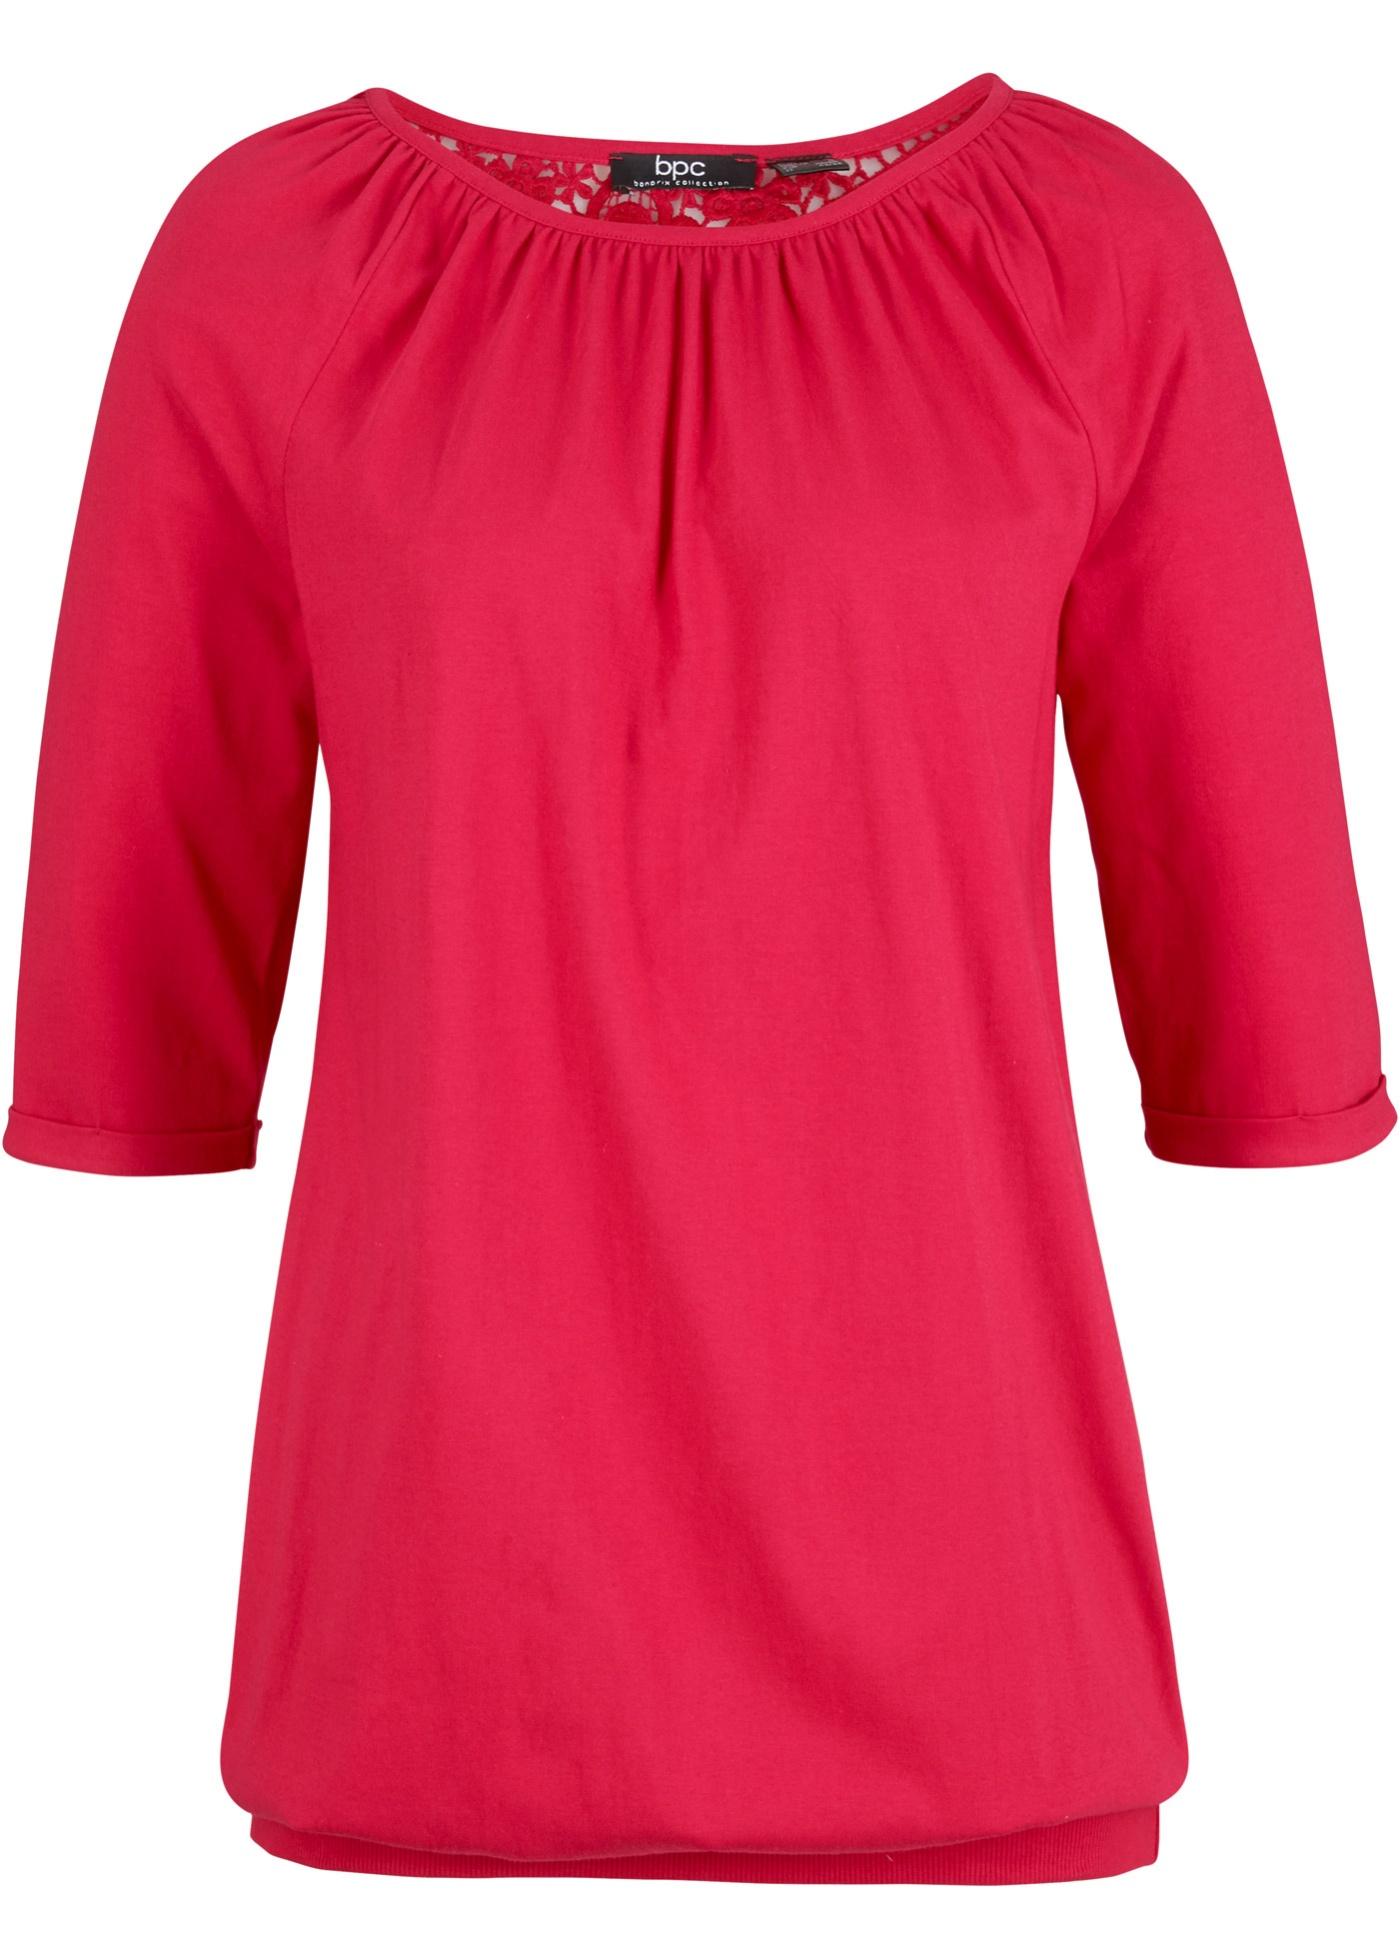 Baumwoll Shirt-Tunika mit Spitze am Rücken